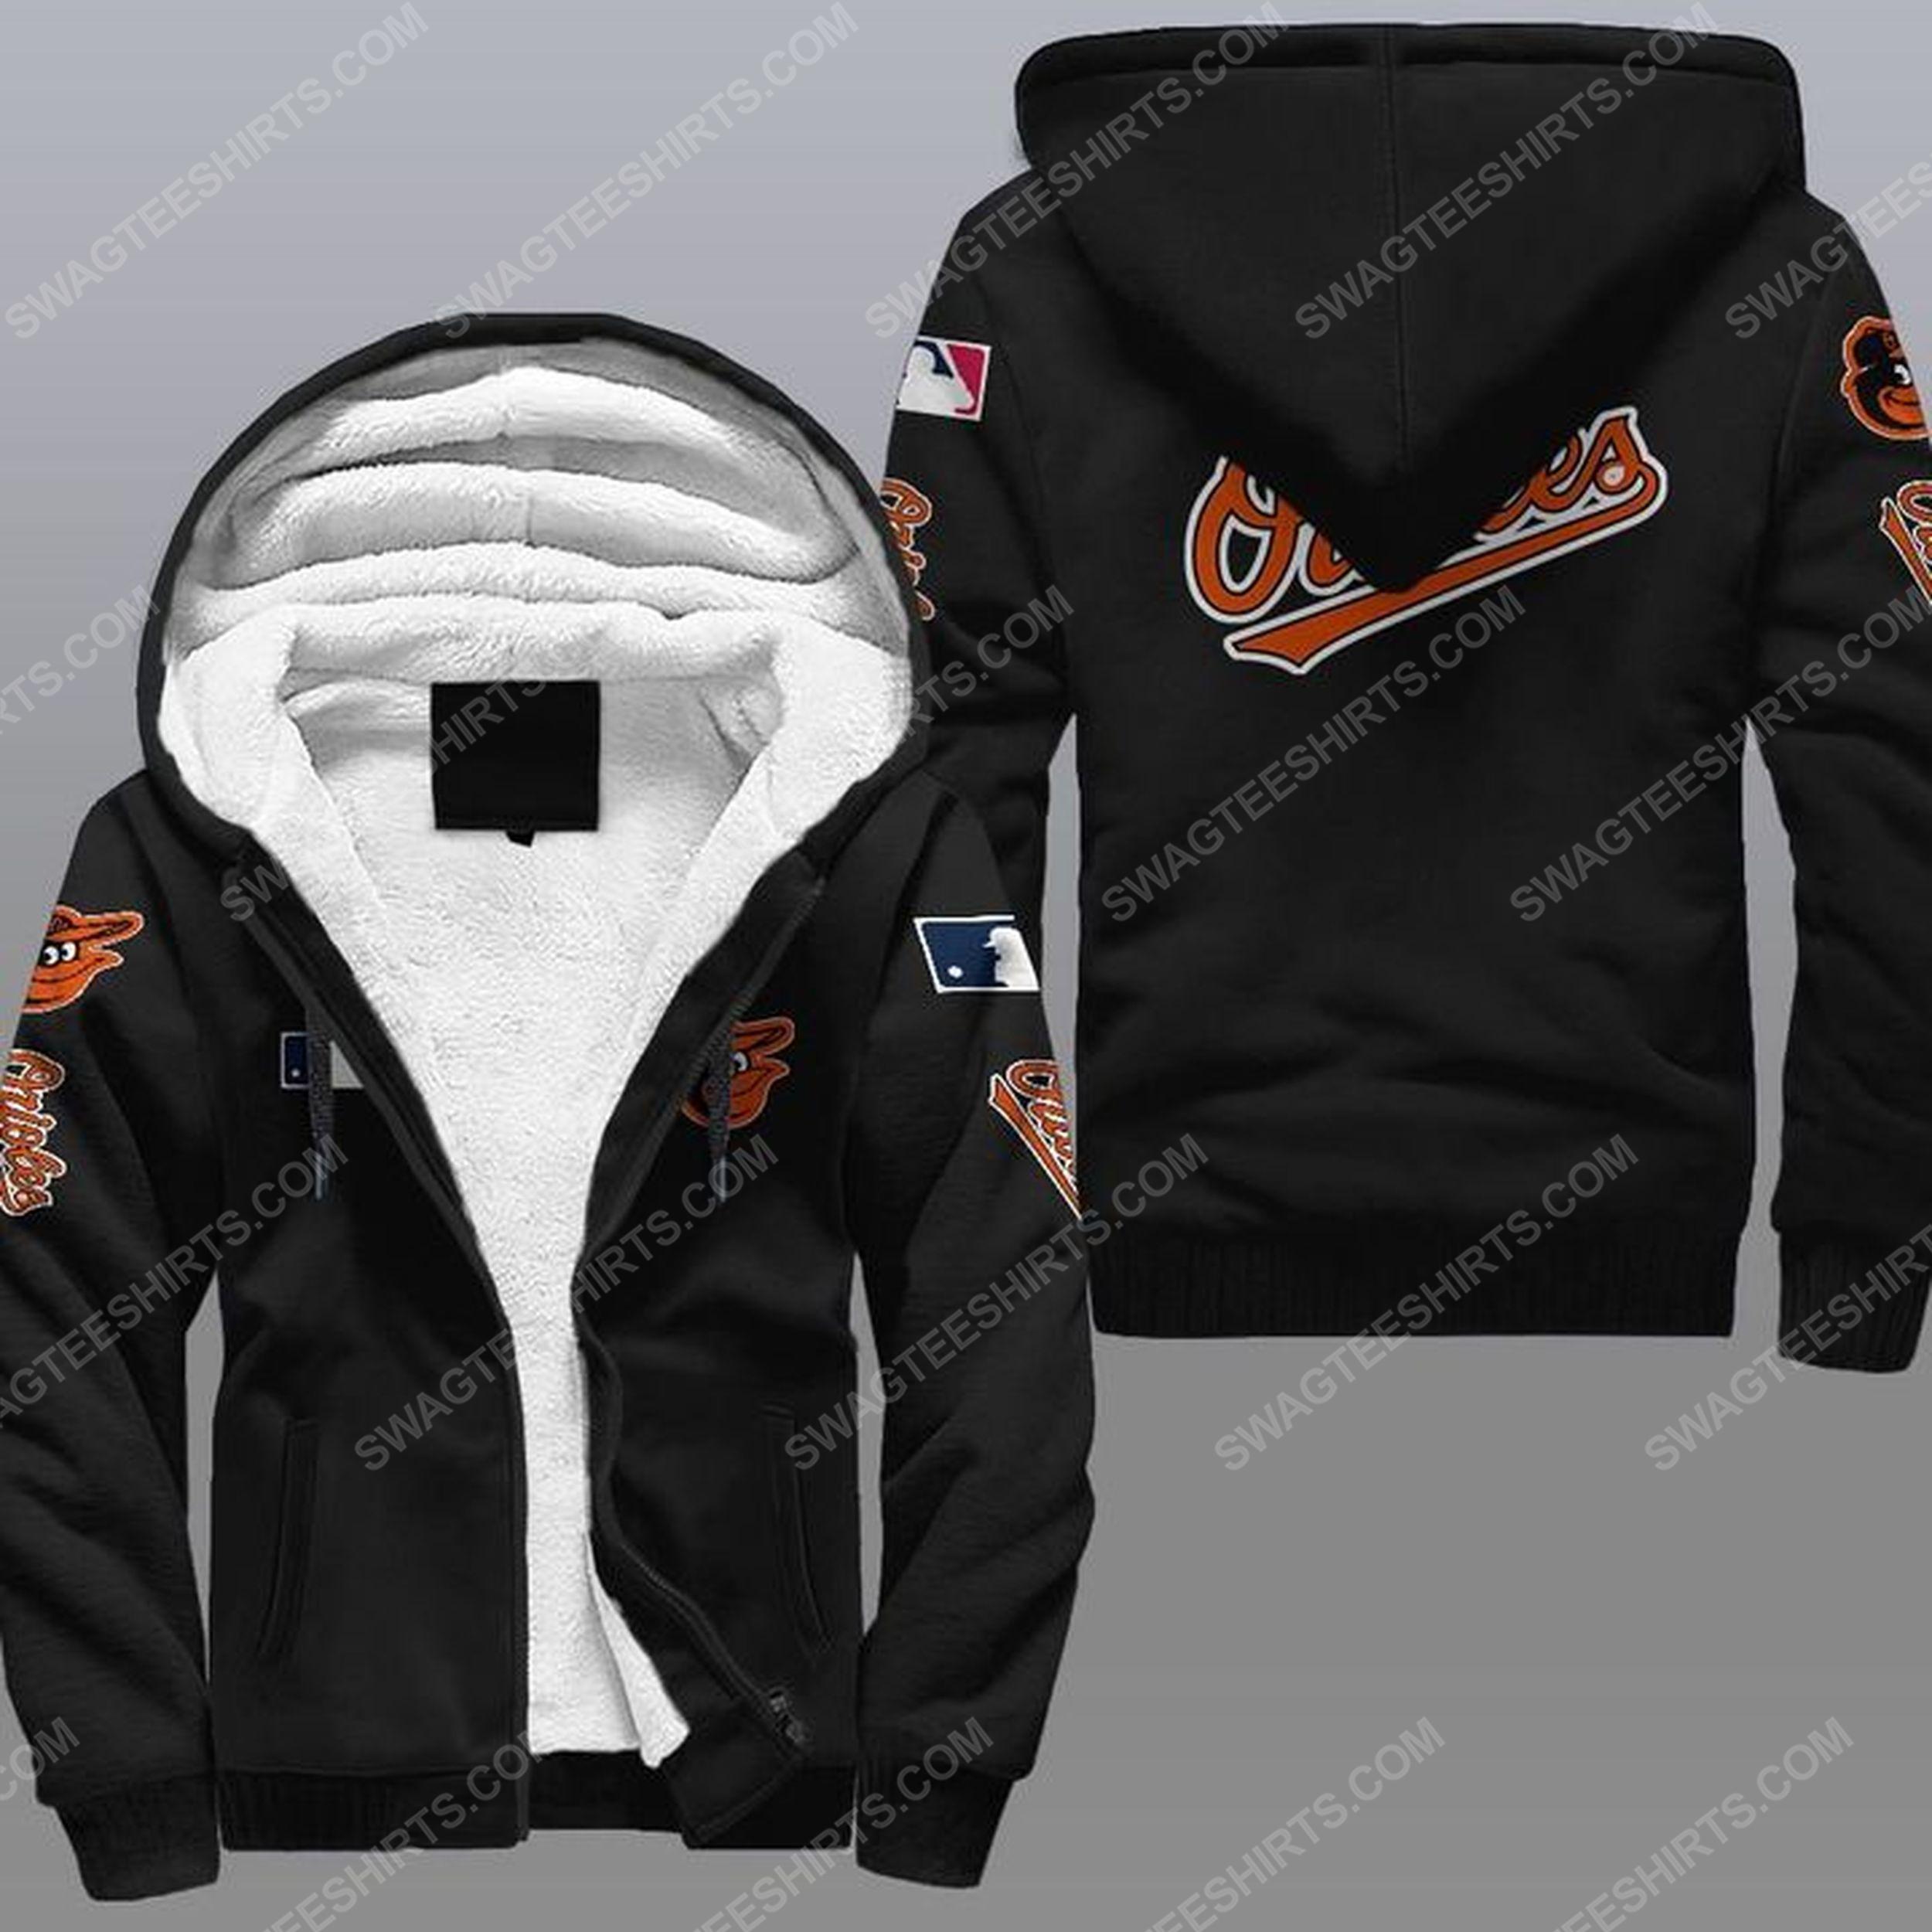 The baltimore orioles mlb all over print fleece hoodie - black 1